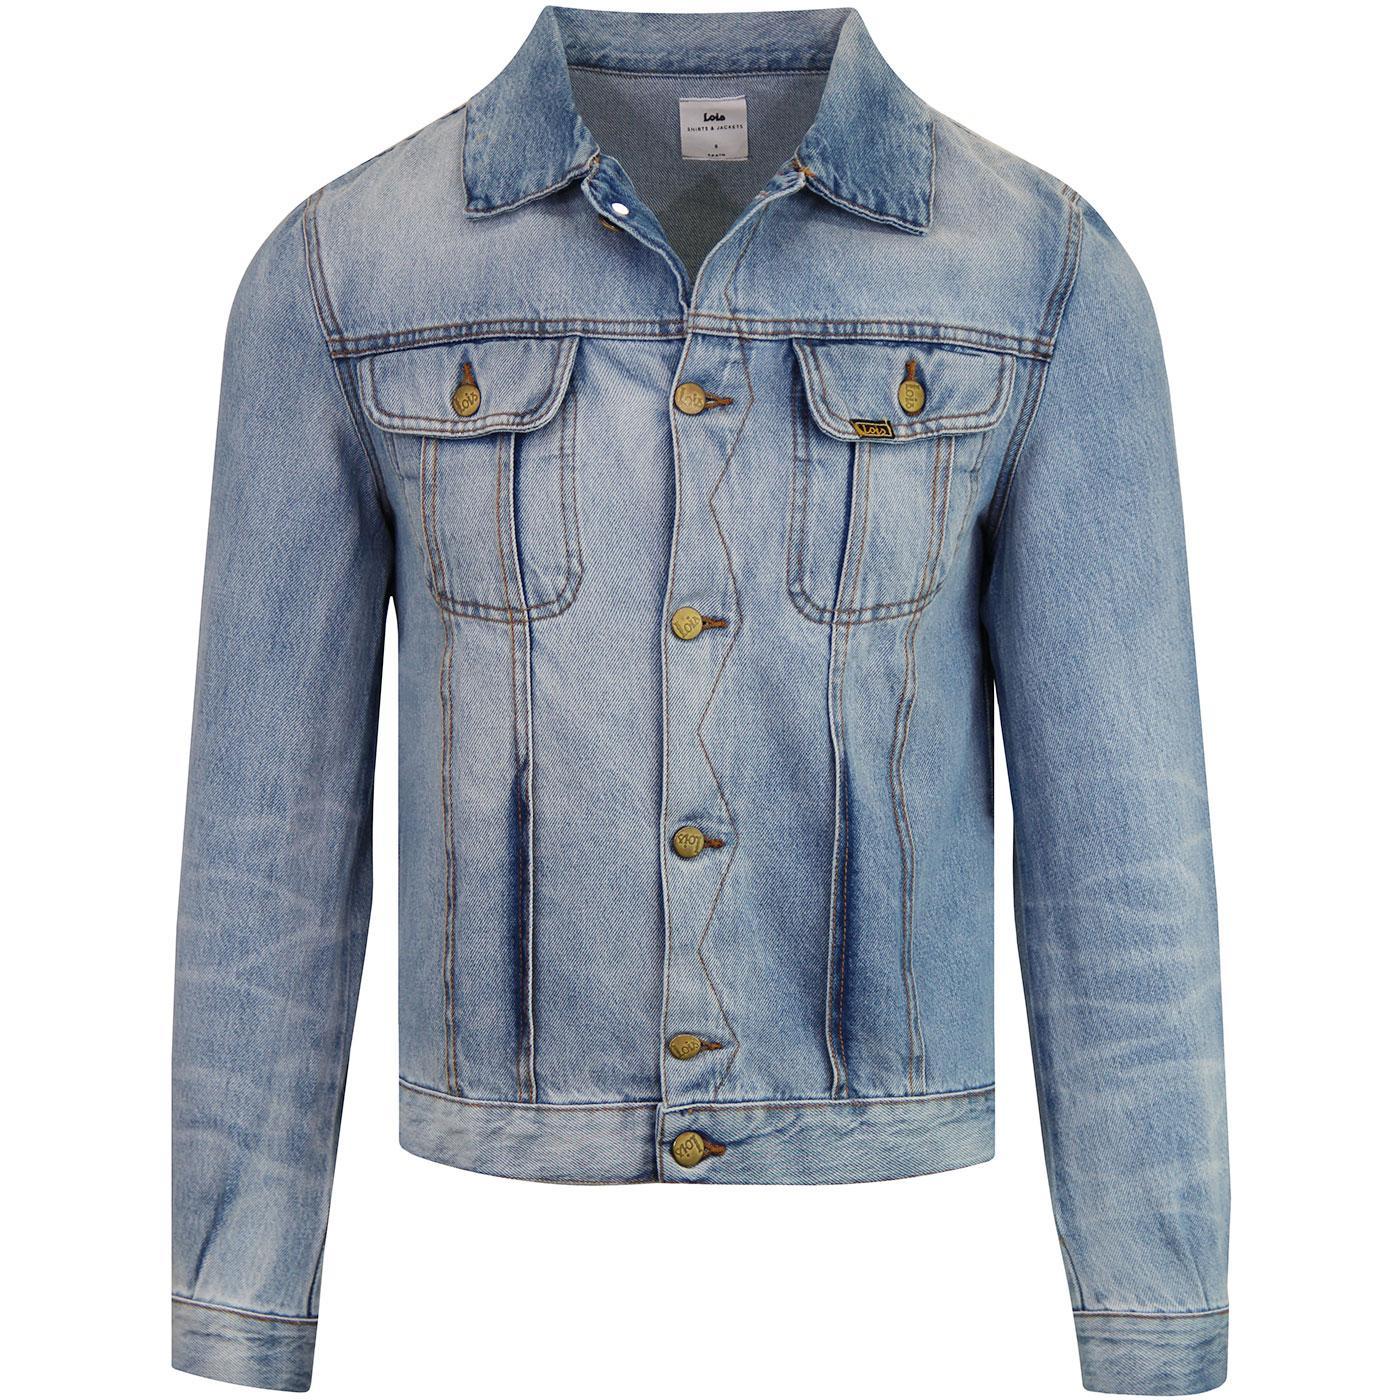 Torero Boy LOIS Retro 60s Distressed Denim Jacket